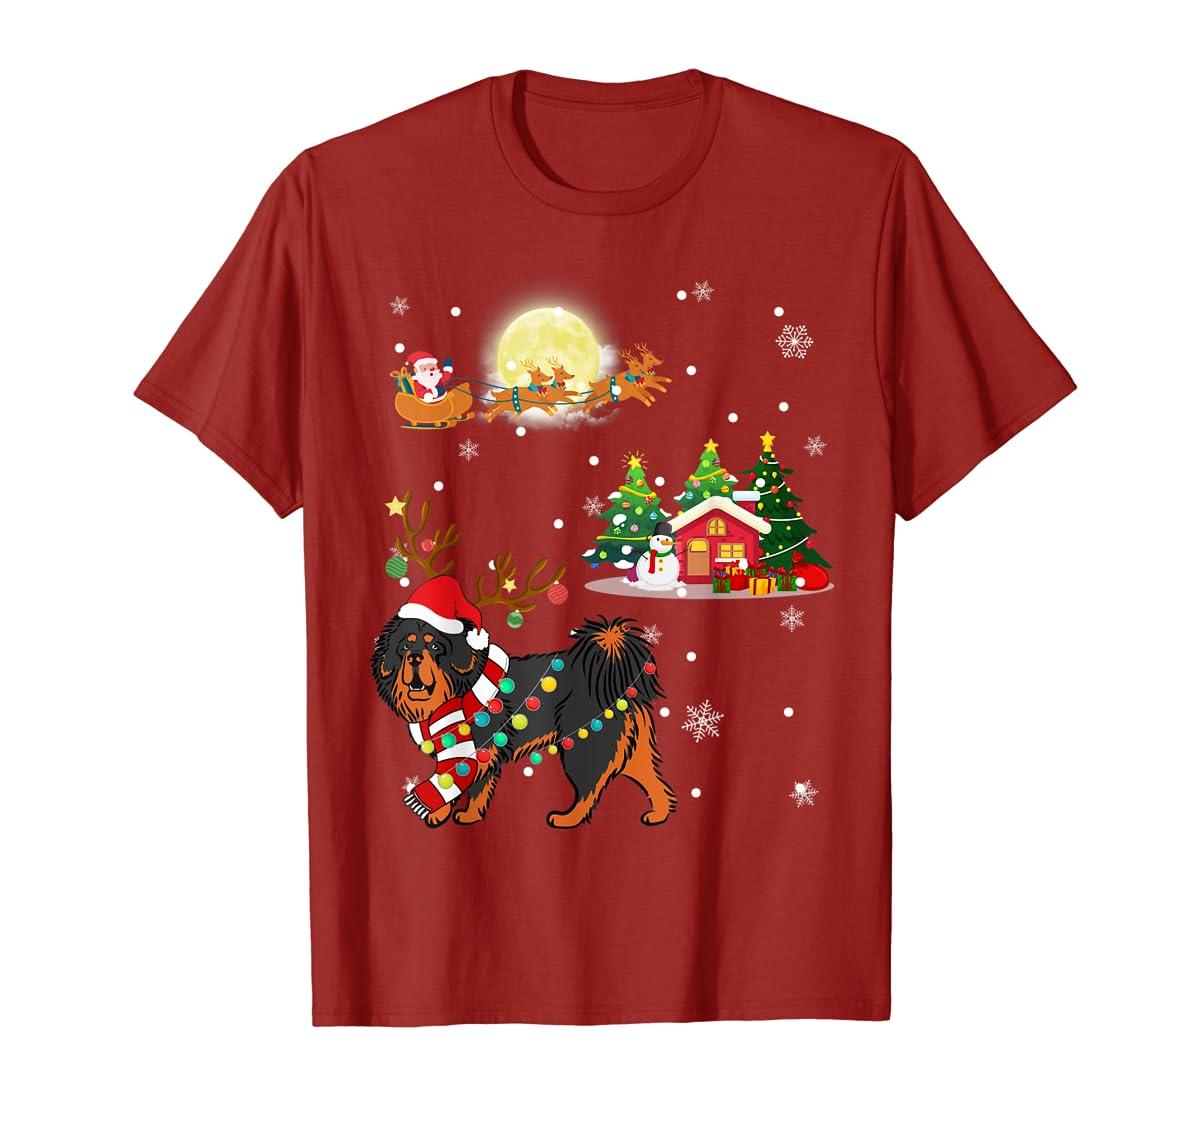 Tibetan Mastiff Dog Led Light Christmas 2019 Gift T-Shirt-Men's T-Shirt-Red